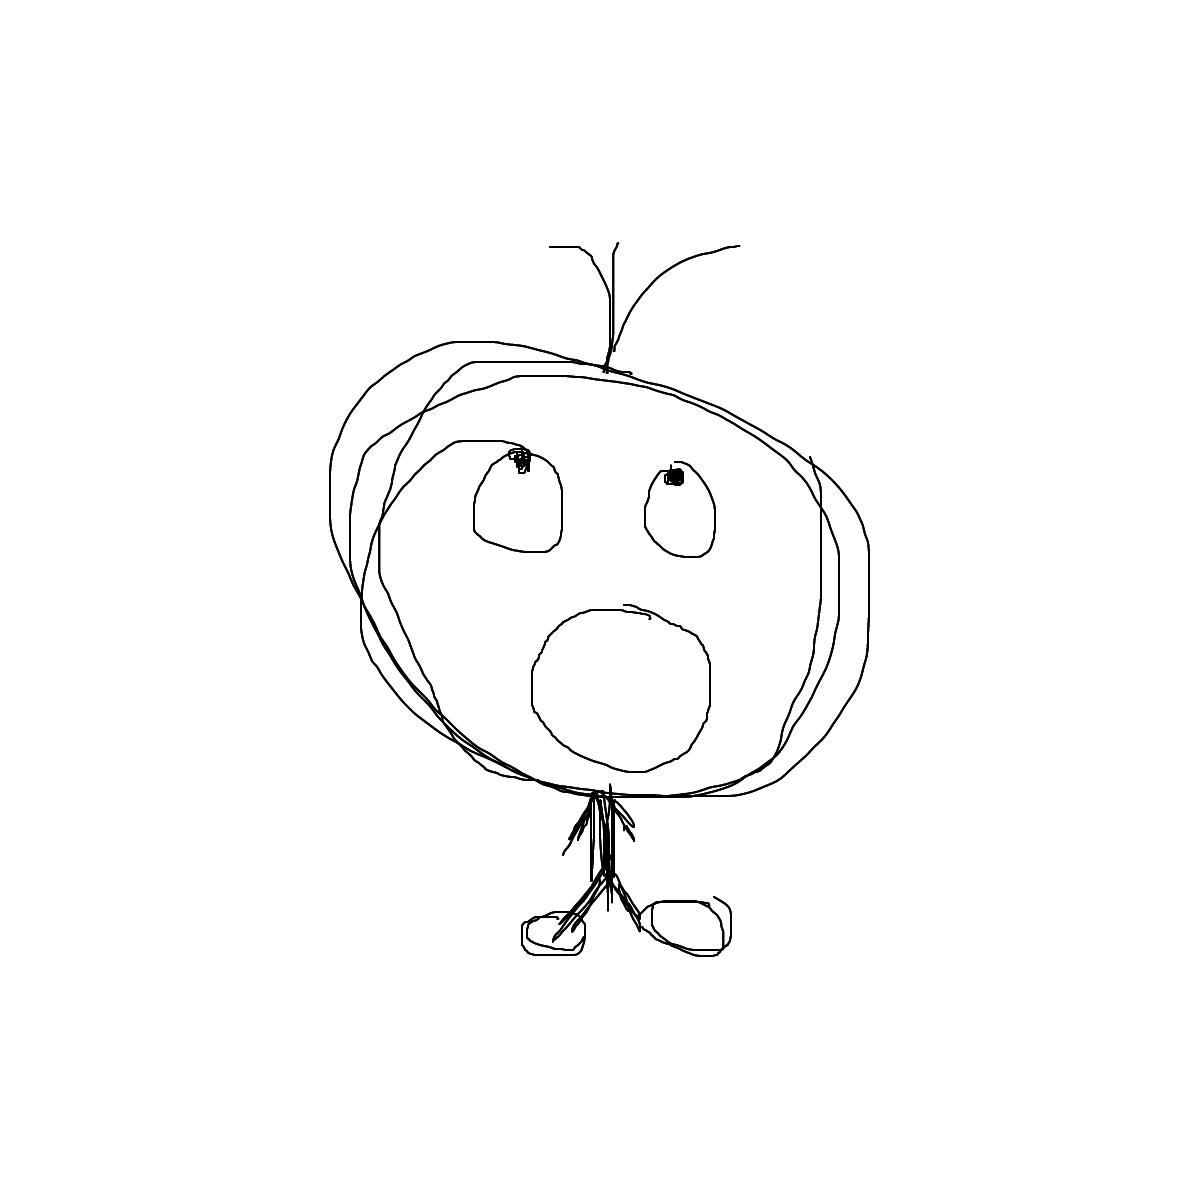 BAAAM drawing#11984 lat:52.4750862121582000lng: 13.4080266952514650